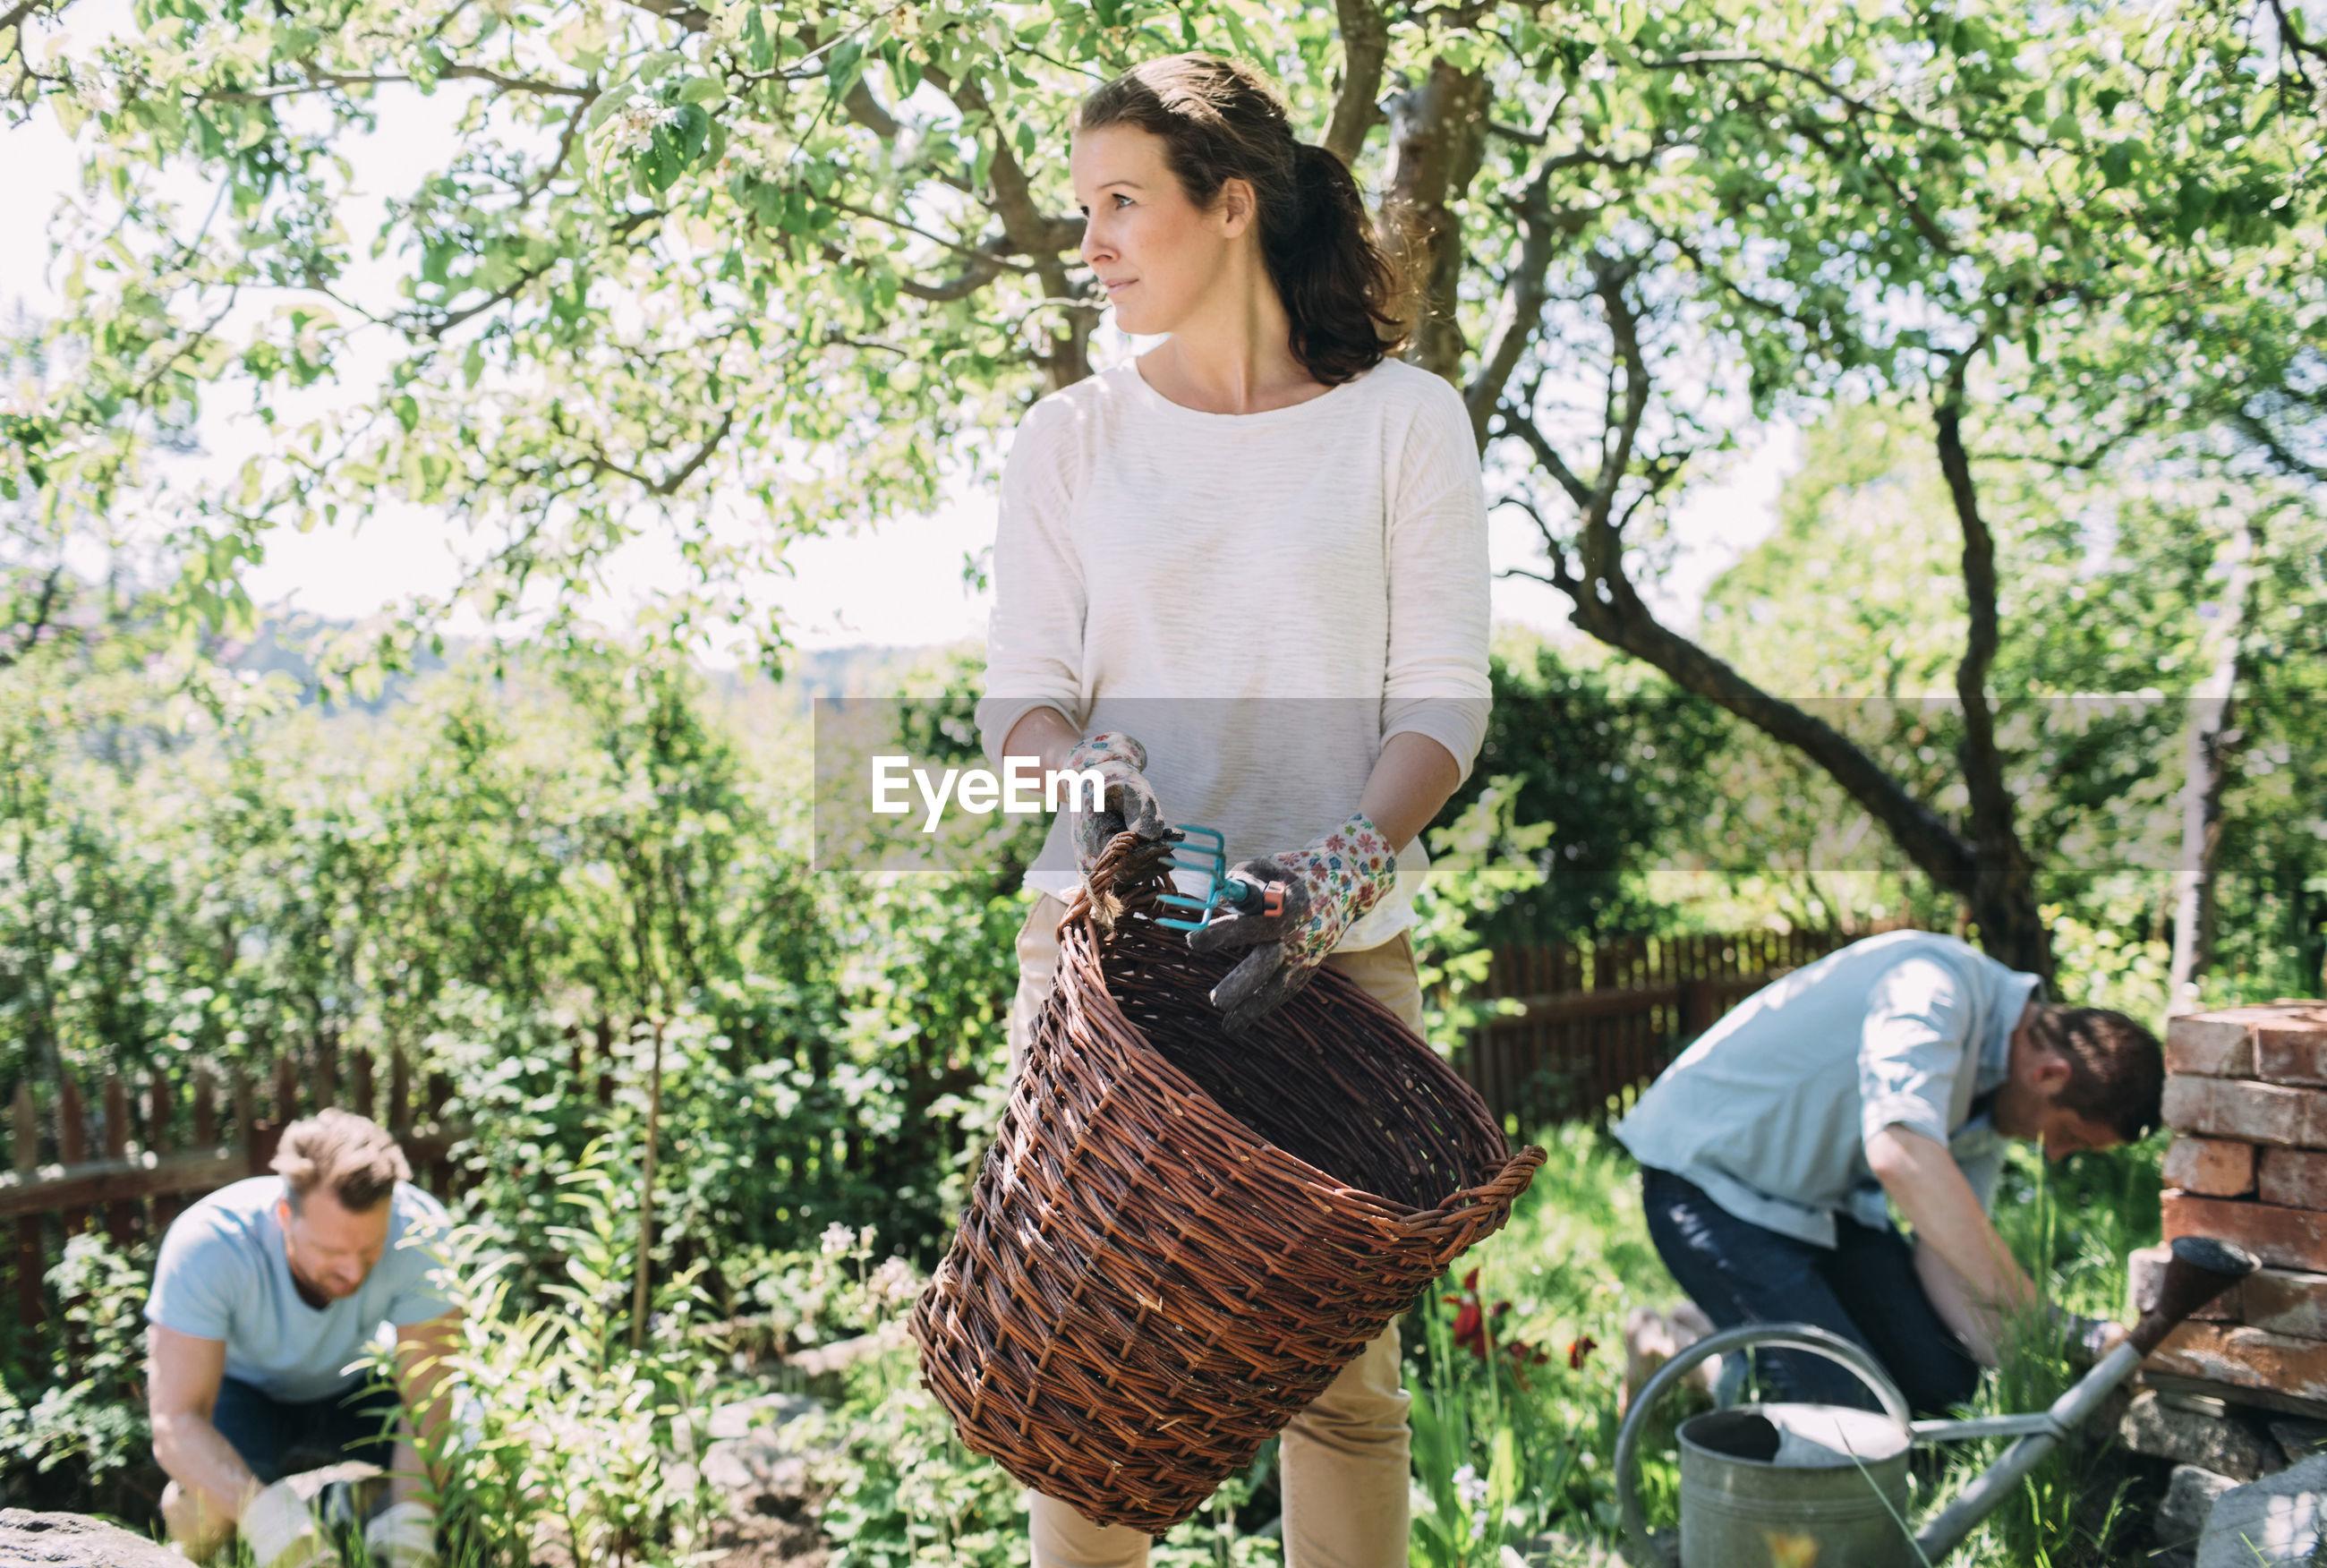 WOMAN STANDING IN BASKET AGAINST TREE